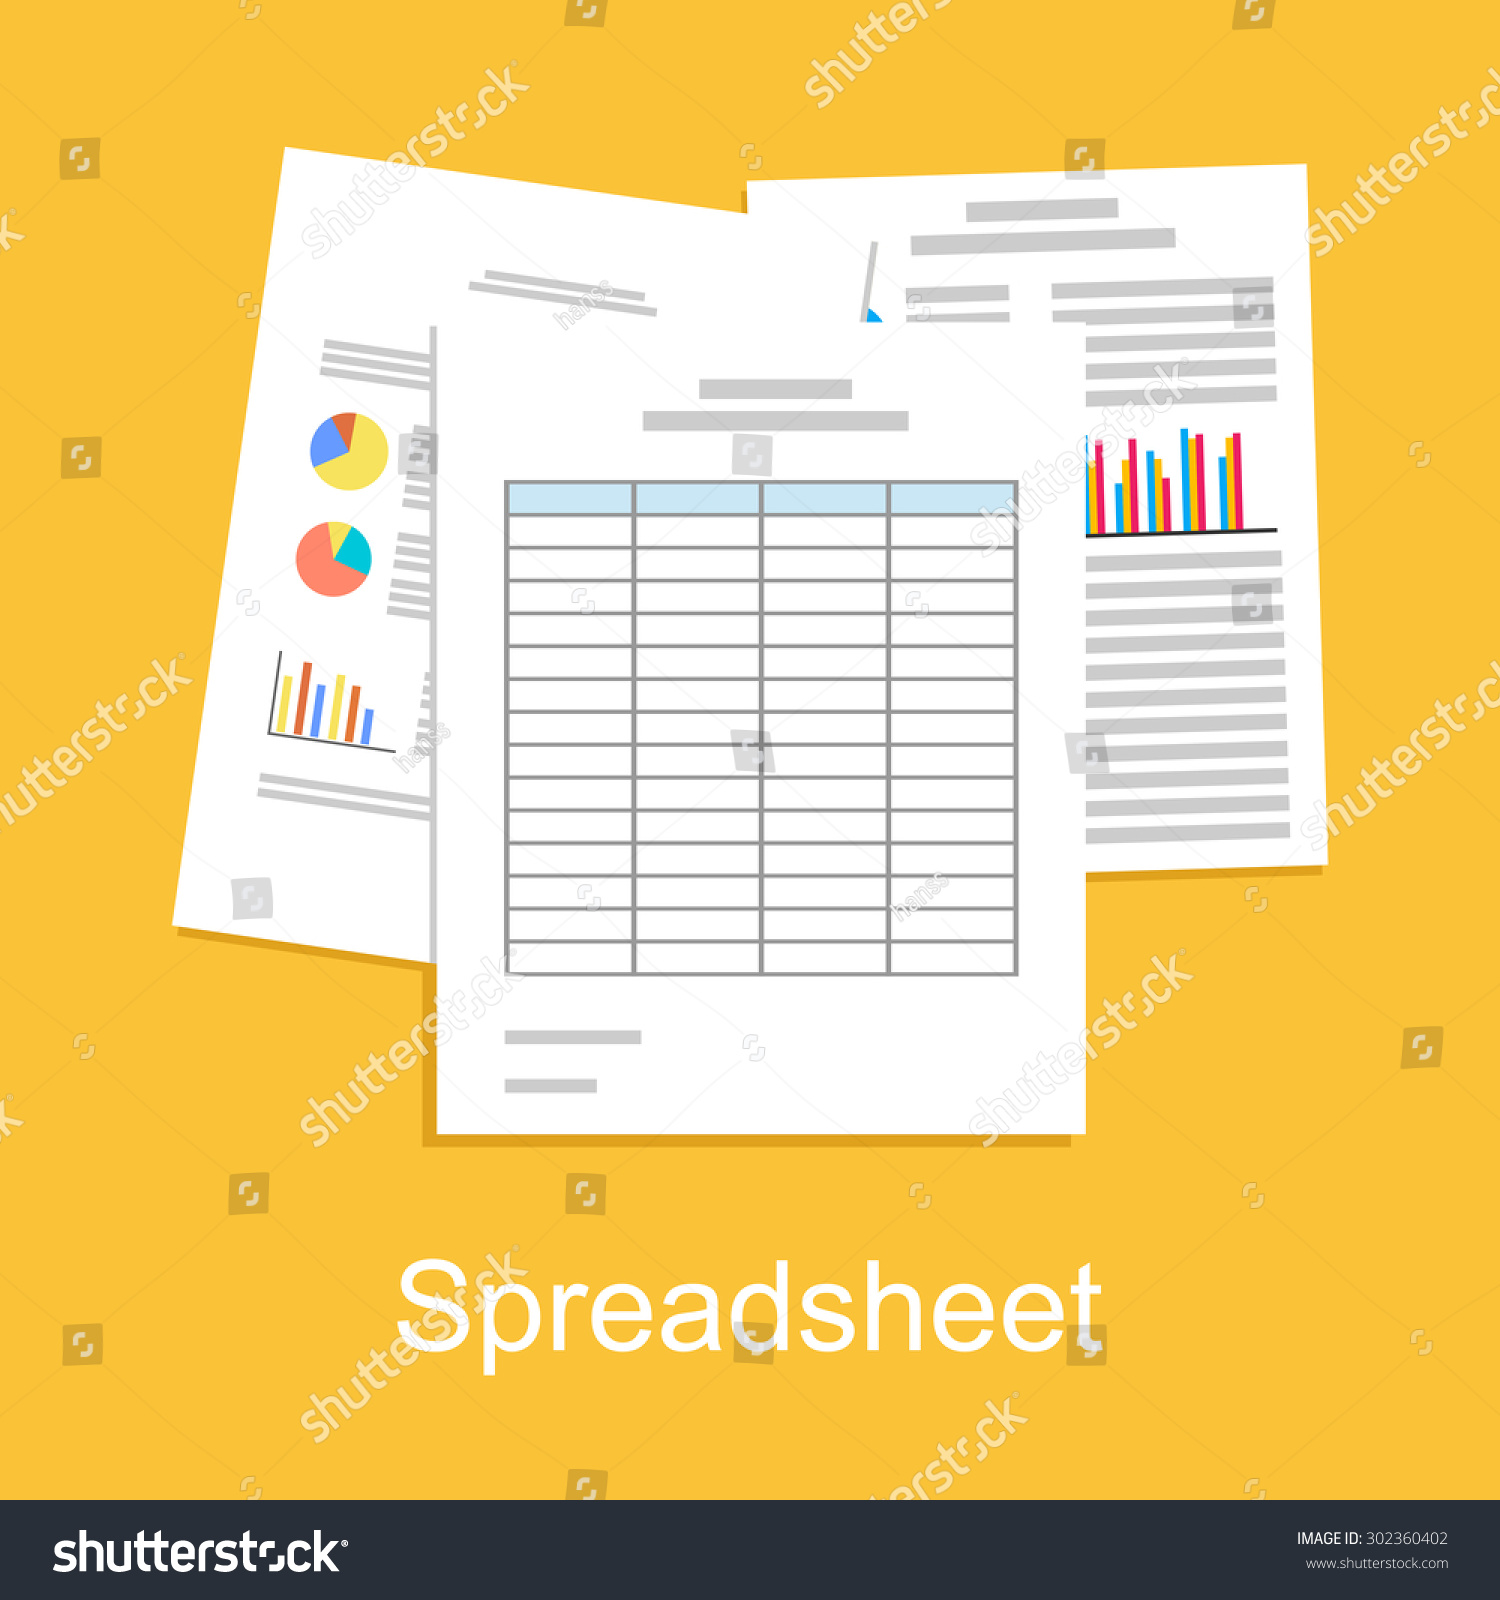 Preschool and Kindergarten Basic Concepts Worksheets